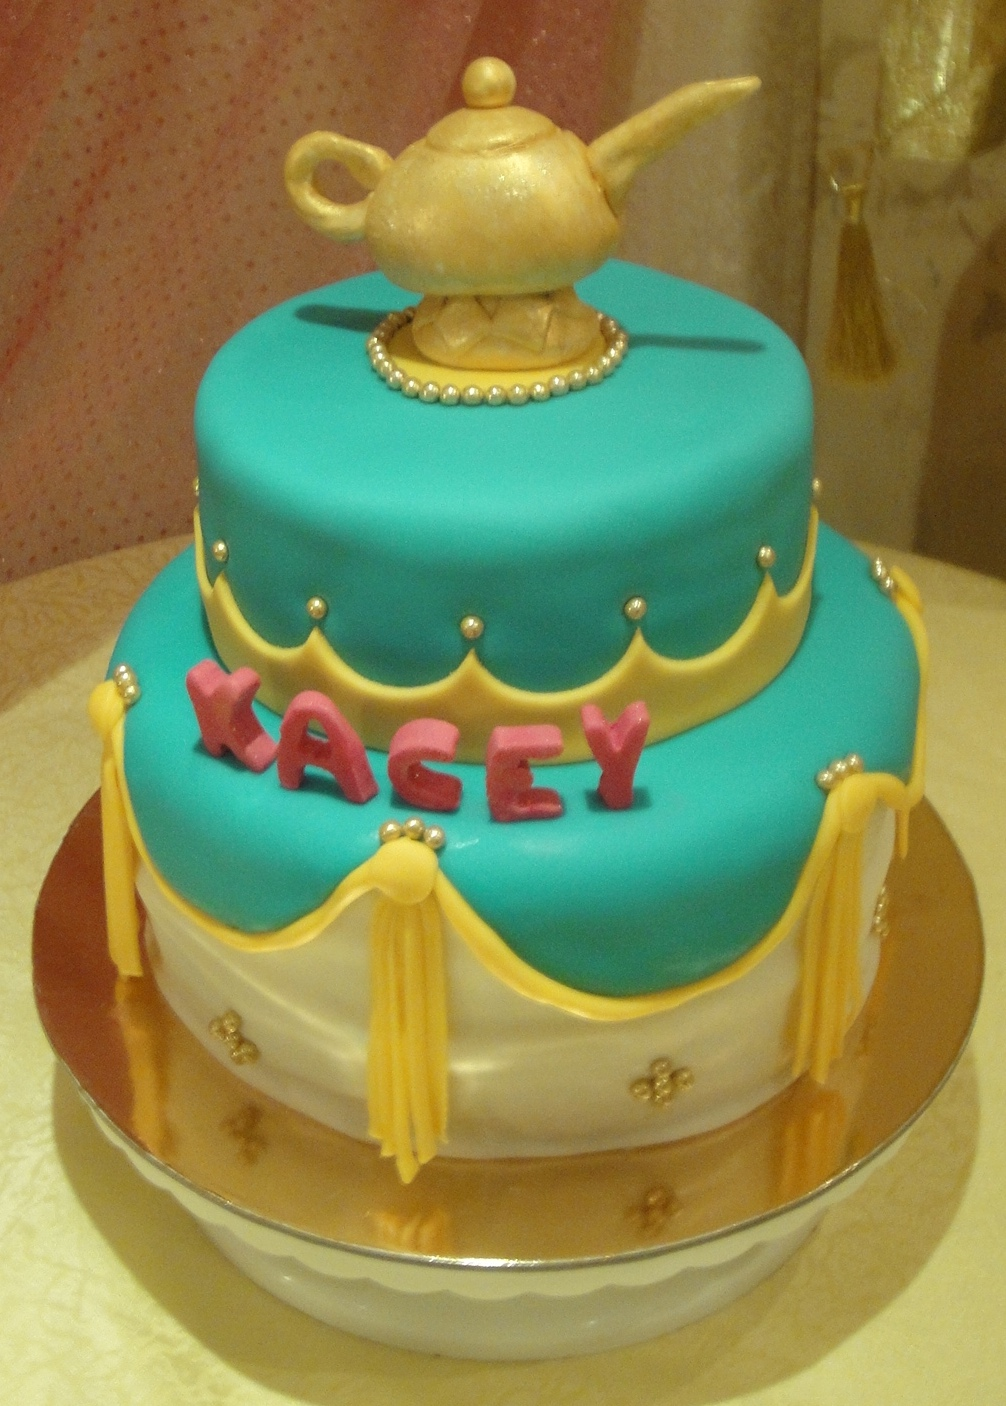 Arabian night themed birthday party chazsm for Arabian cake decoration